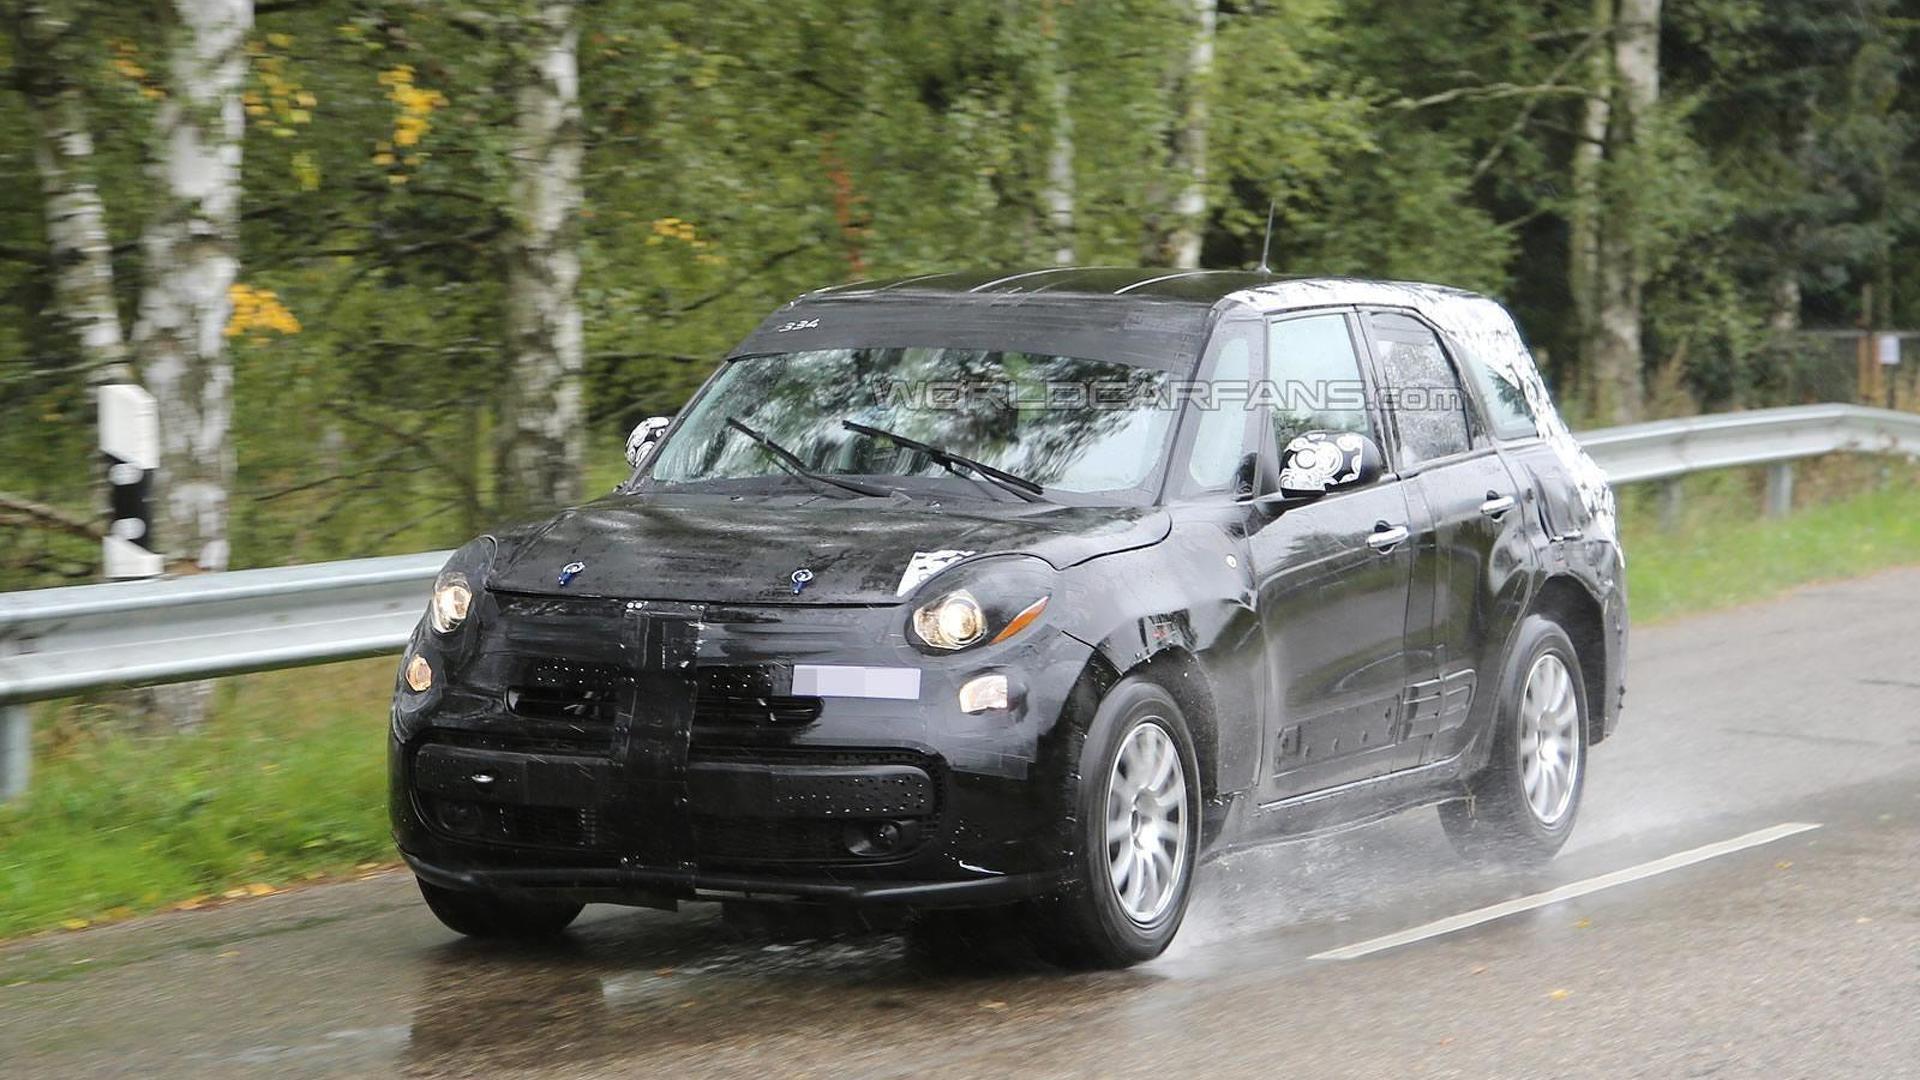 euro cars and cross fiat pin test urban wagon spec wallpaper